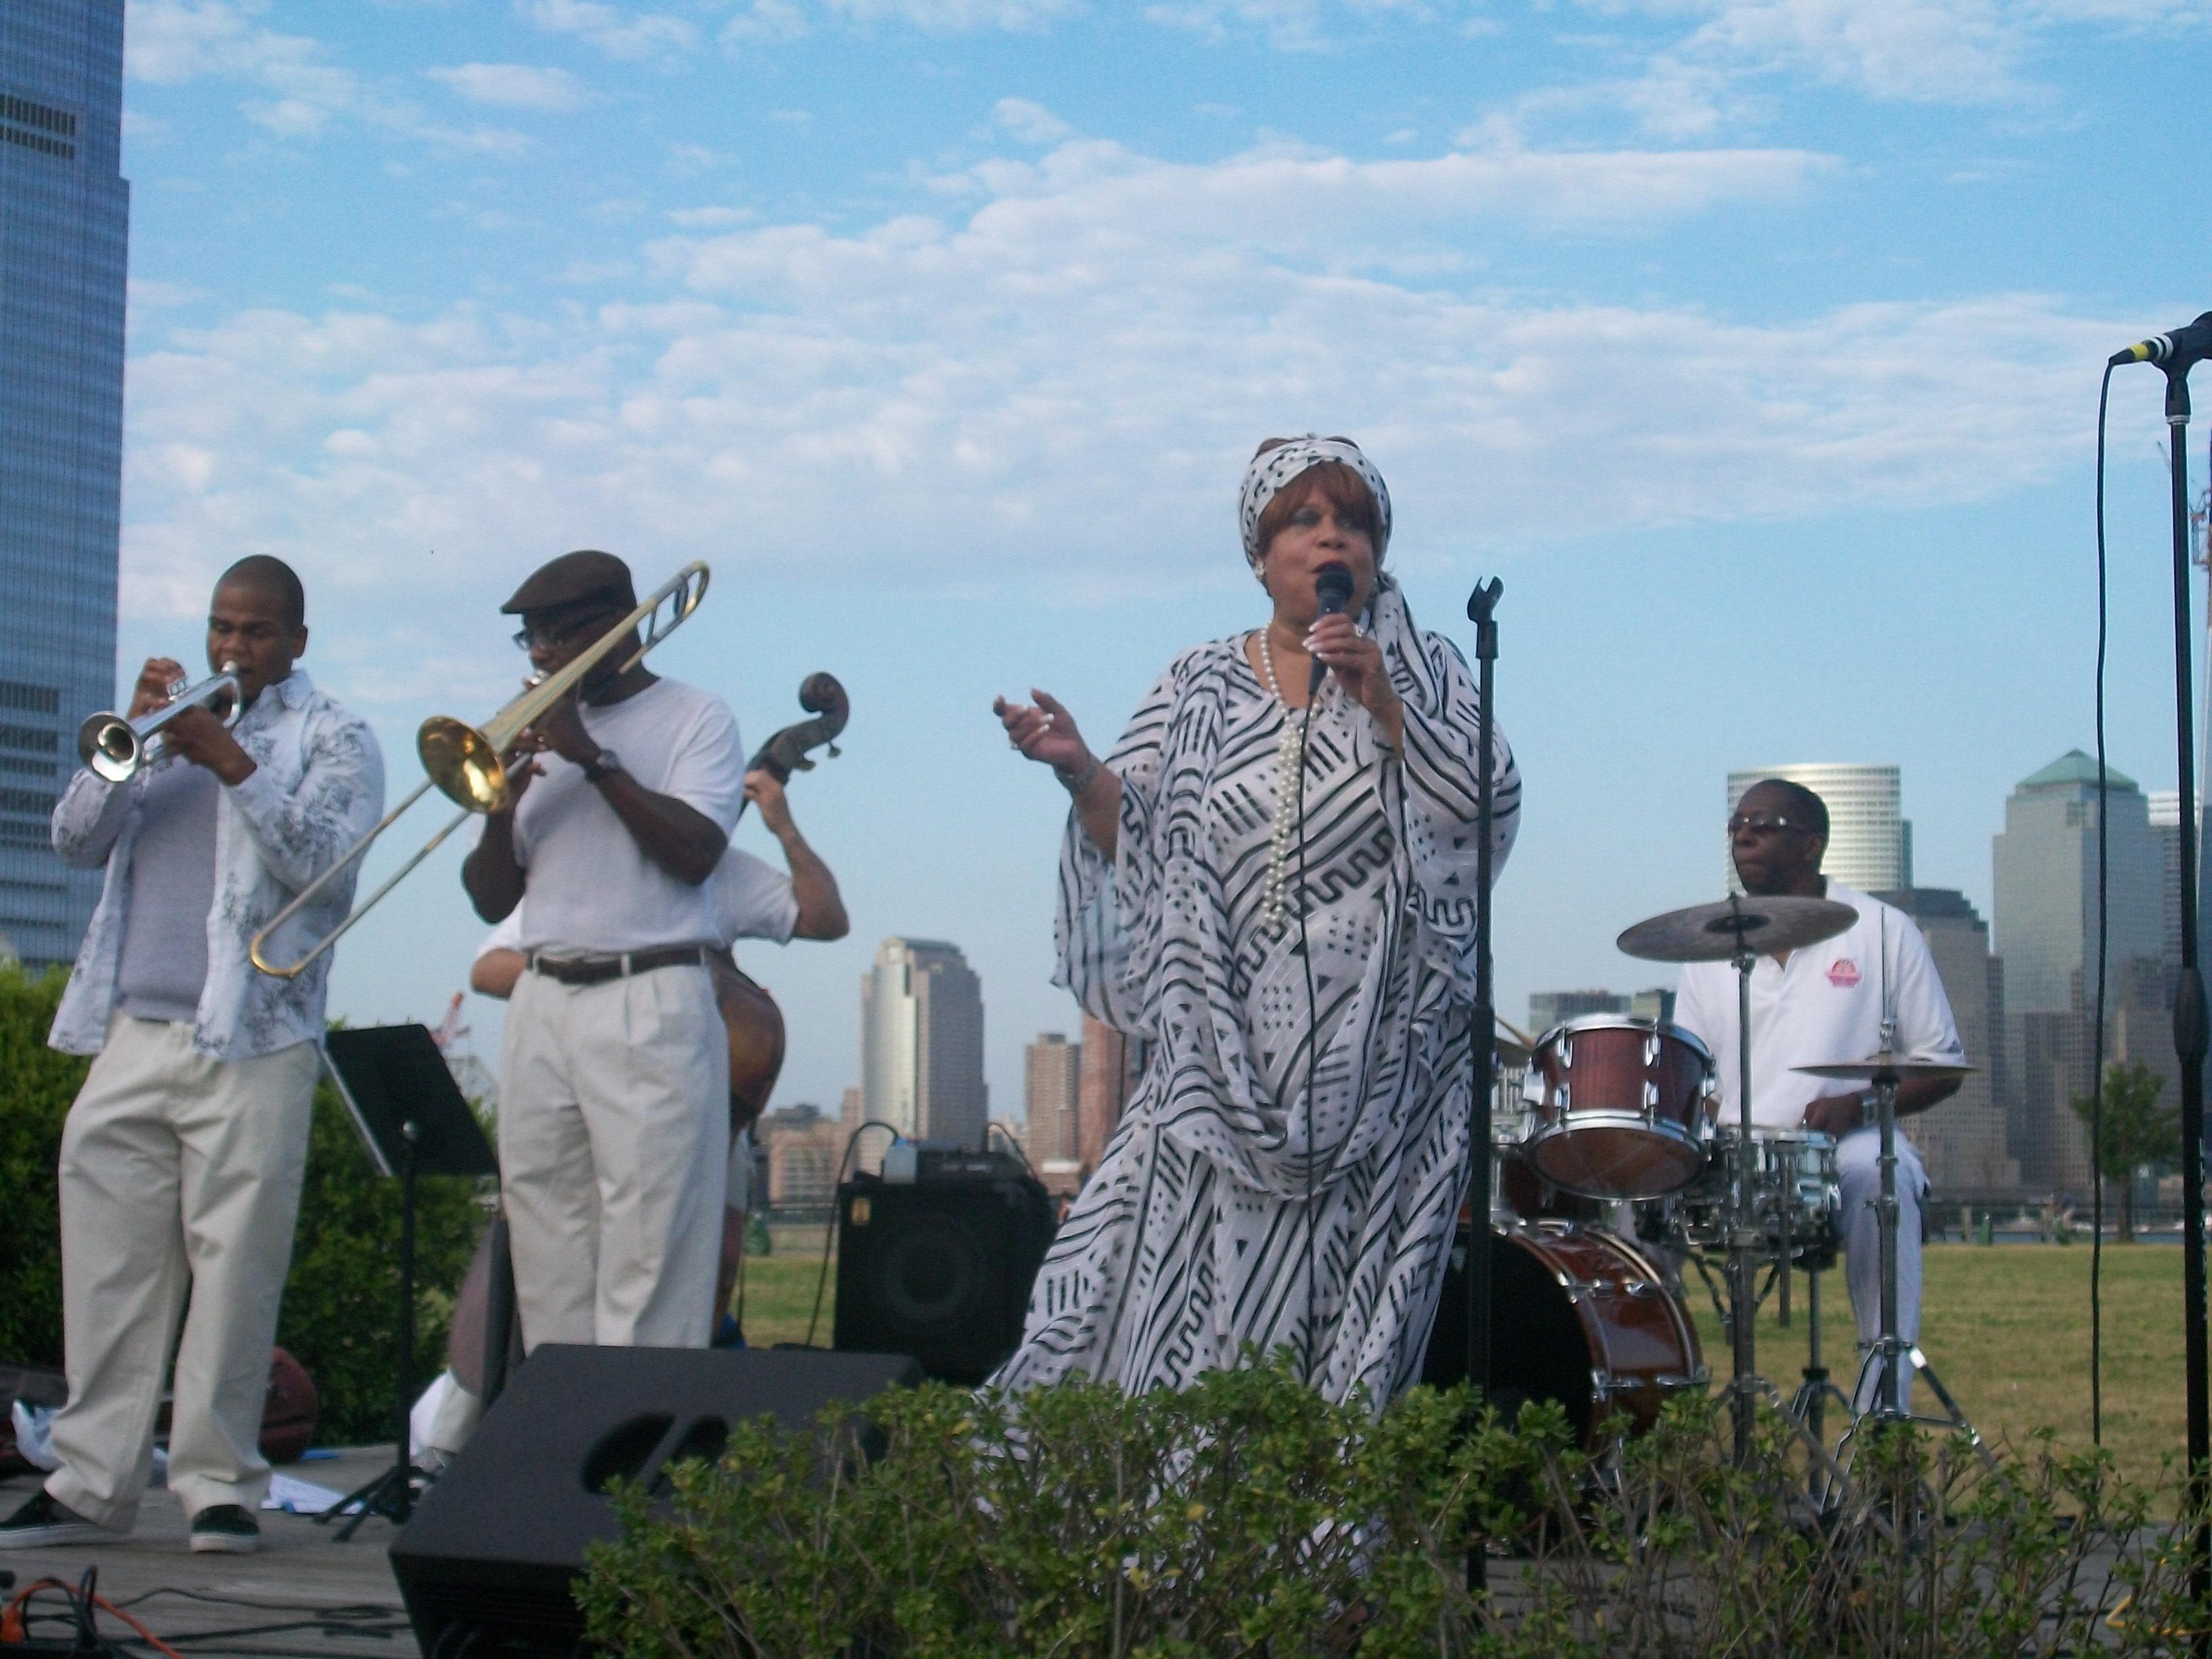 Jersey City Summerfest 2012